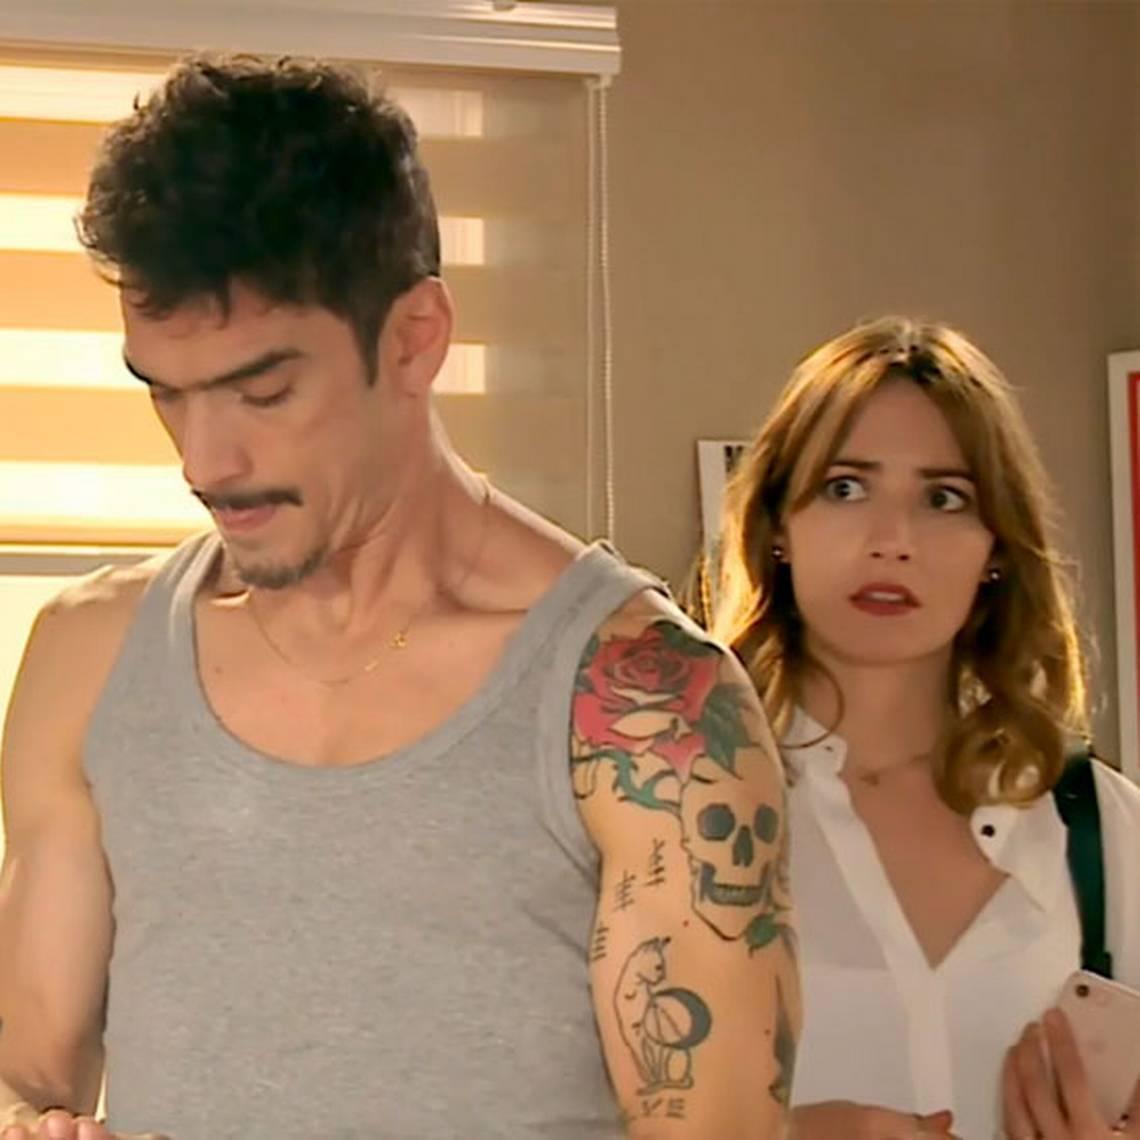 Fernanda comienza a sospechar